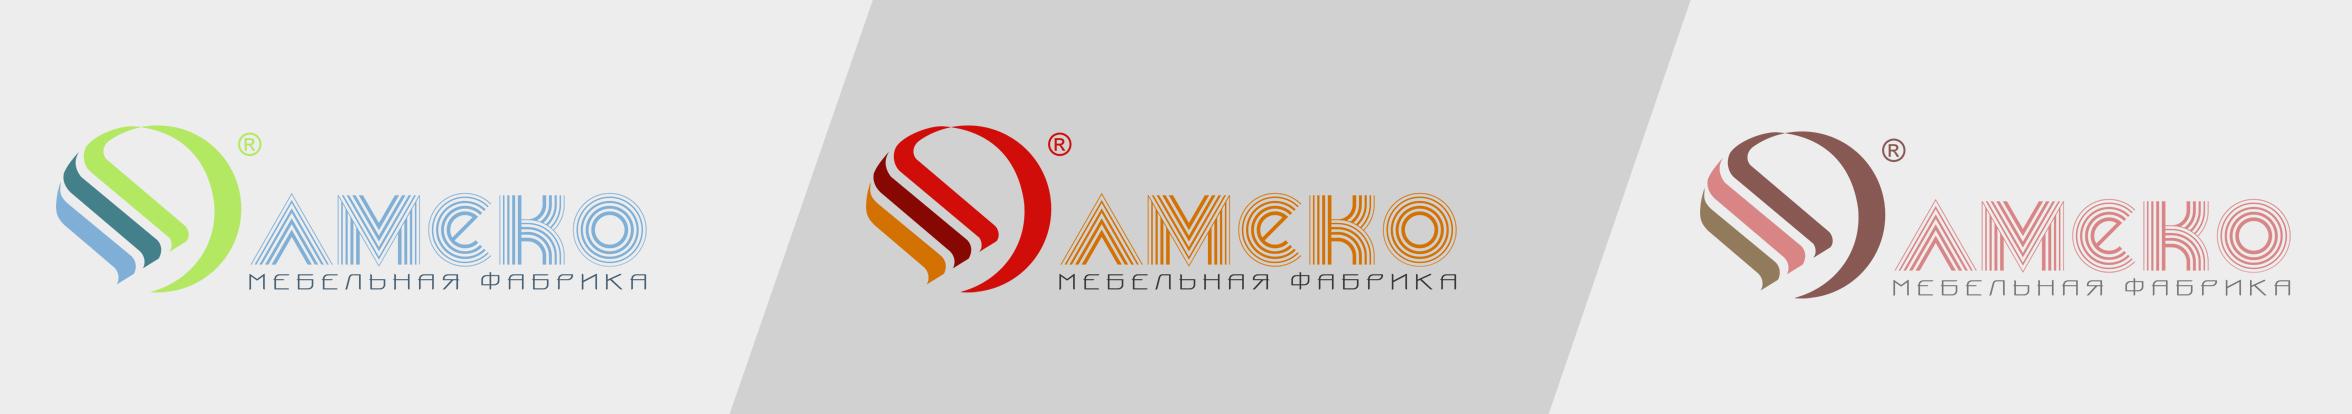 Ребрендинг/Редизайн логотипа Мебельной Фабрики фото f_8725491f31116570.jpg